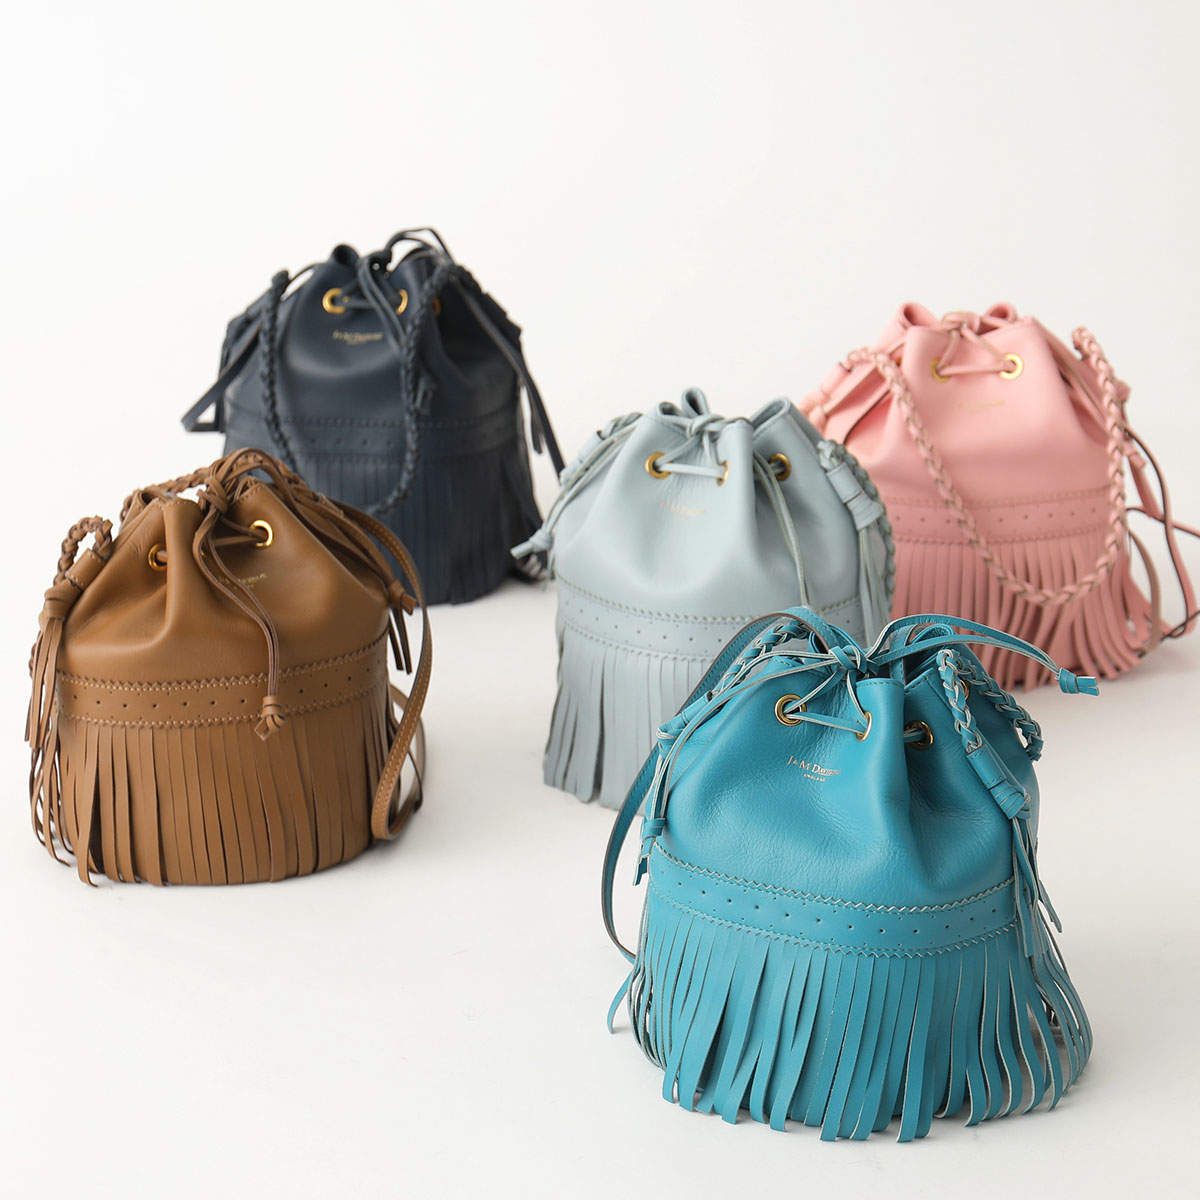 J&M DAVIDSON ジェイアンドエム デヴィッドソン 1355 7314 カラー5色 M CARNIVAL エム カーニバル フリンジ ショルダーバッグ 巾着バッグ 鞄 レディース